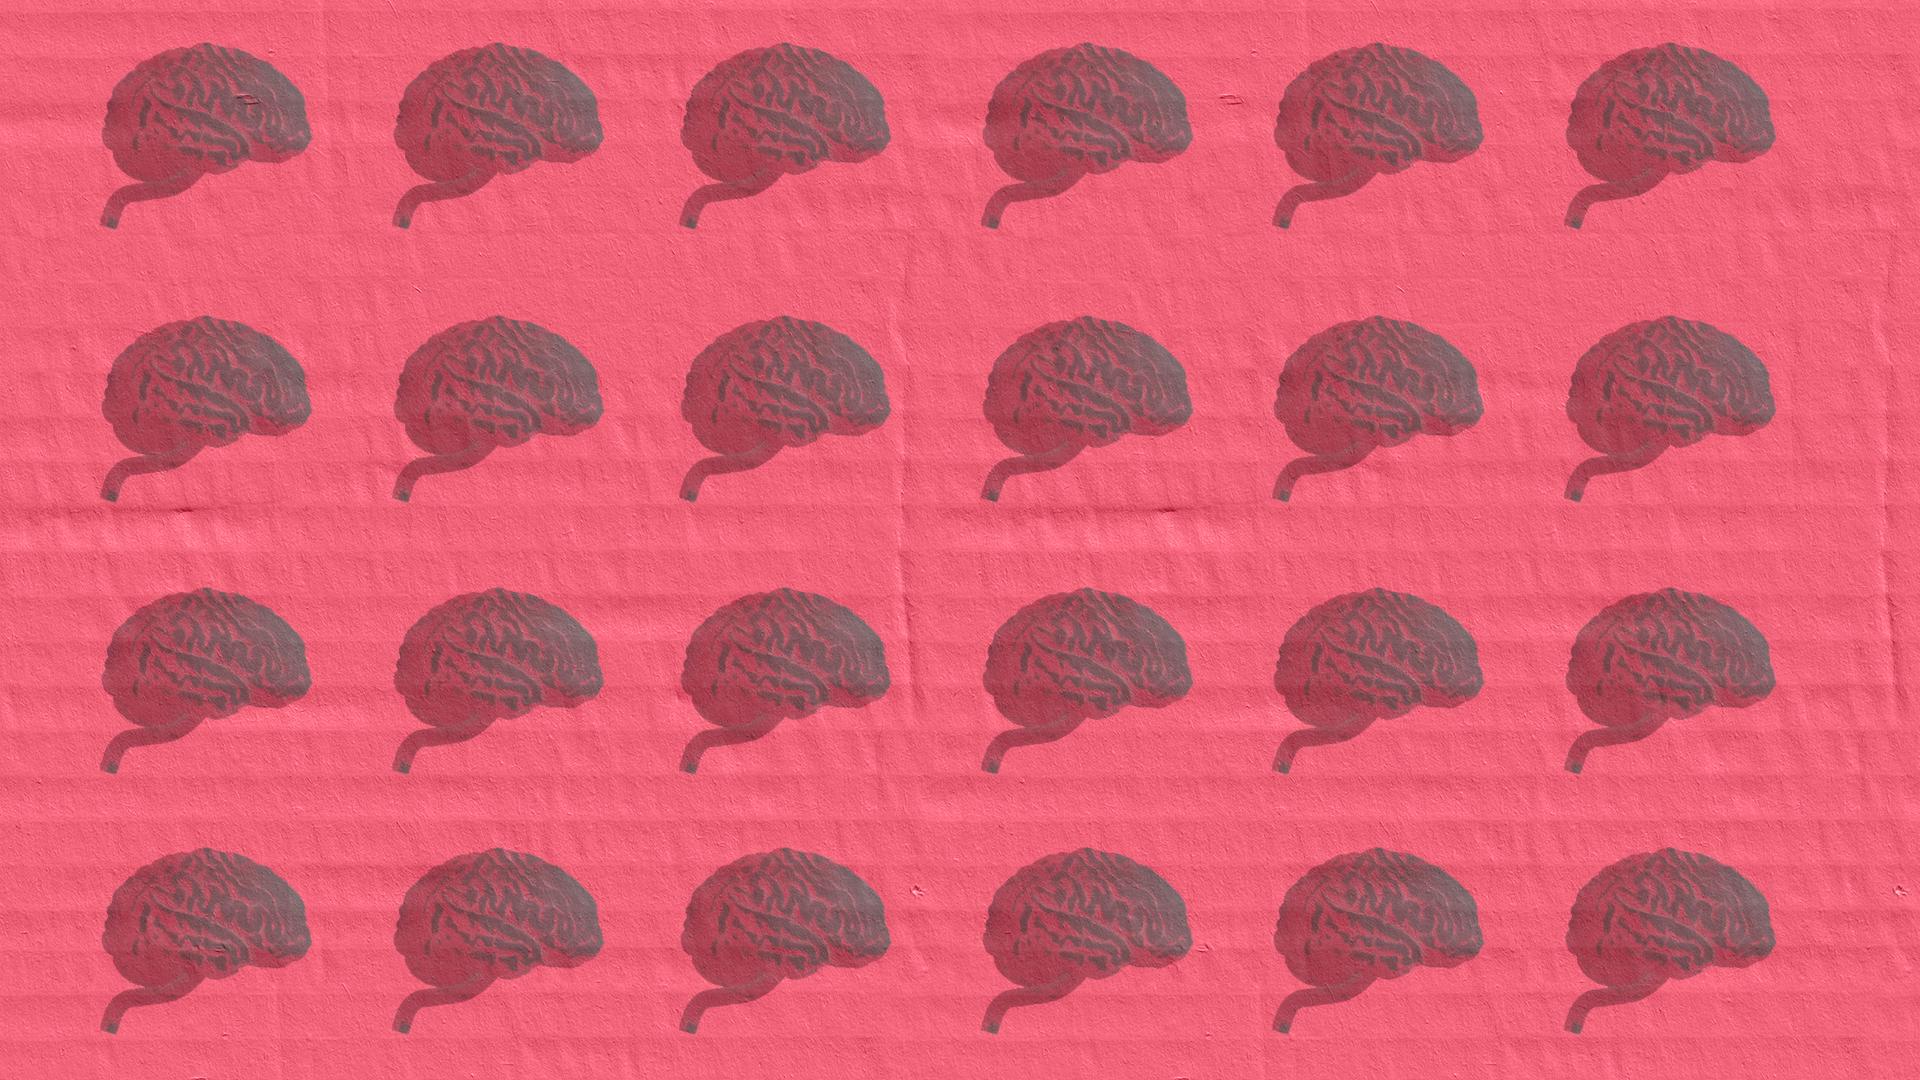 Brainpattern_01